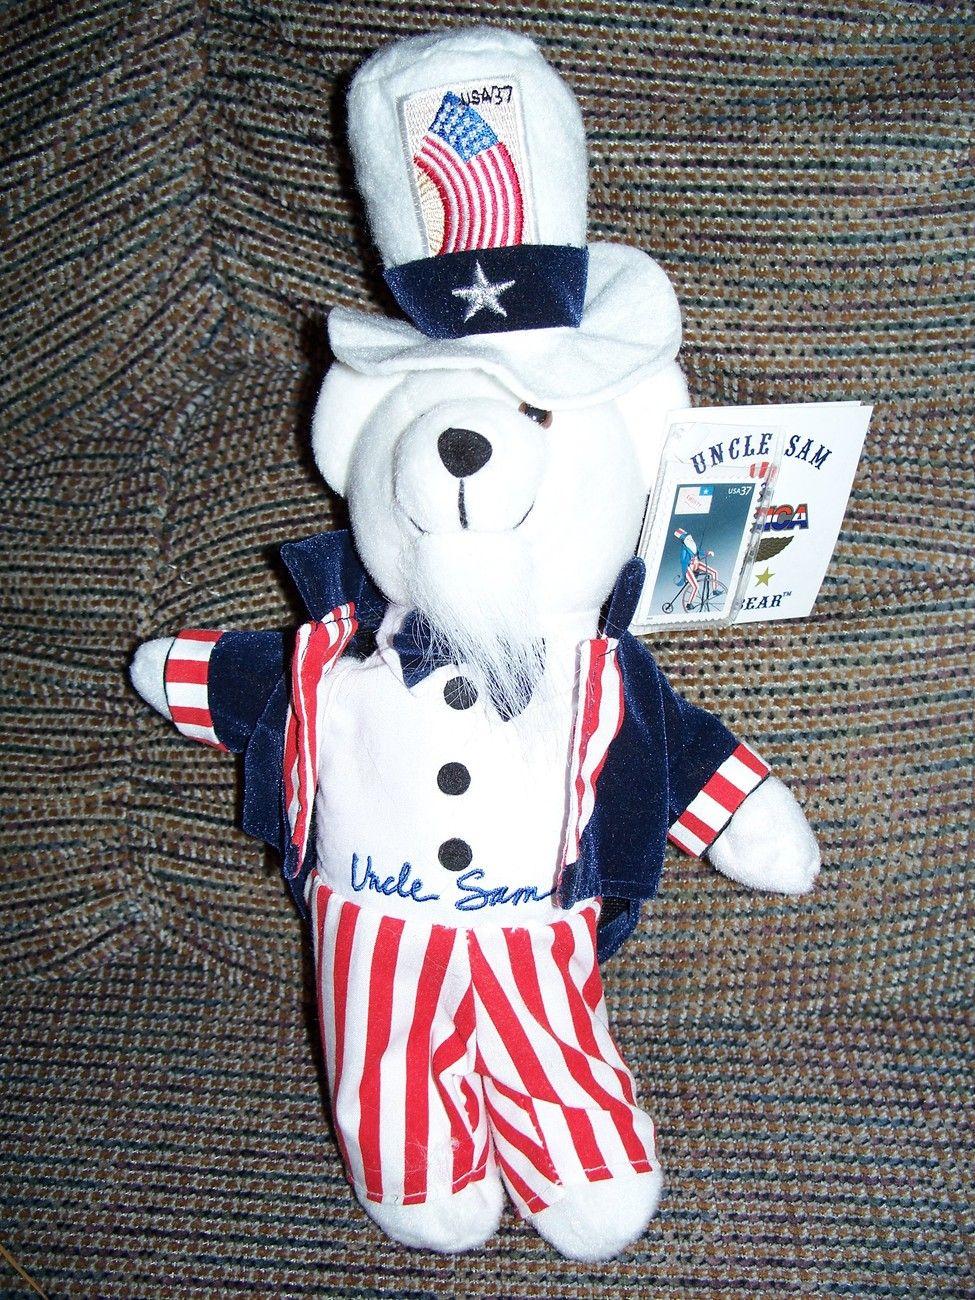 USPS Stamp Bear 37c Uncle Sam Bear w/tags stamp